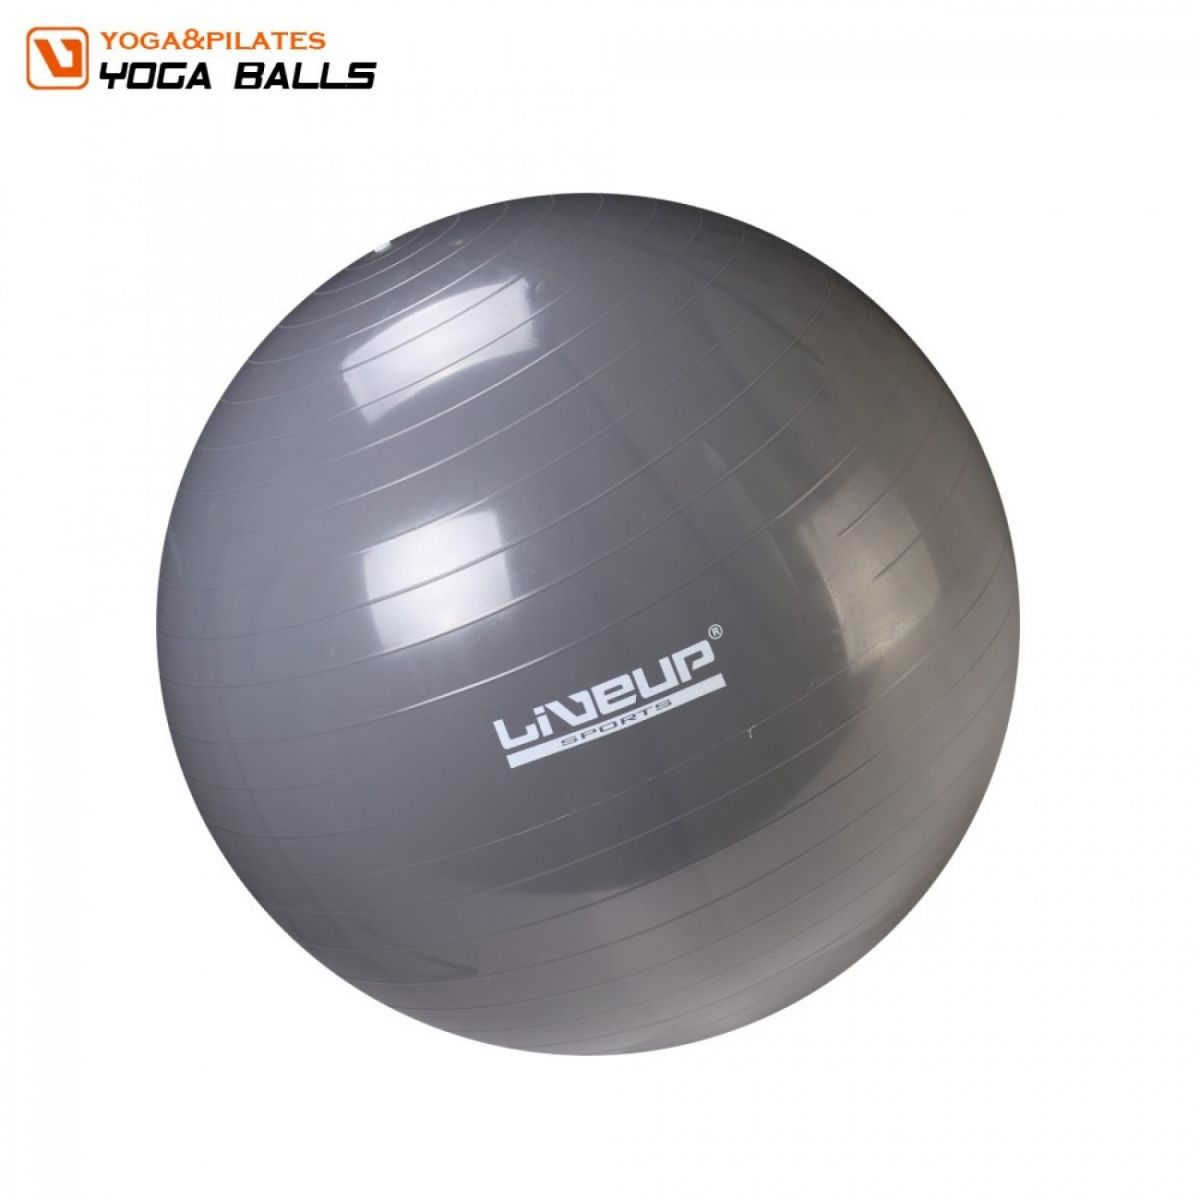 Bola Suíça Para Pilates 85Cm Live Up + Grátis Bomba Inflar - Loja Portal